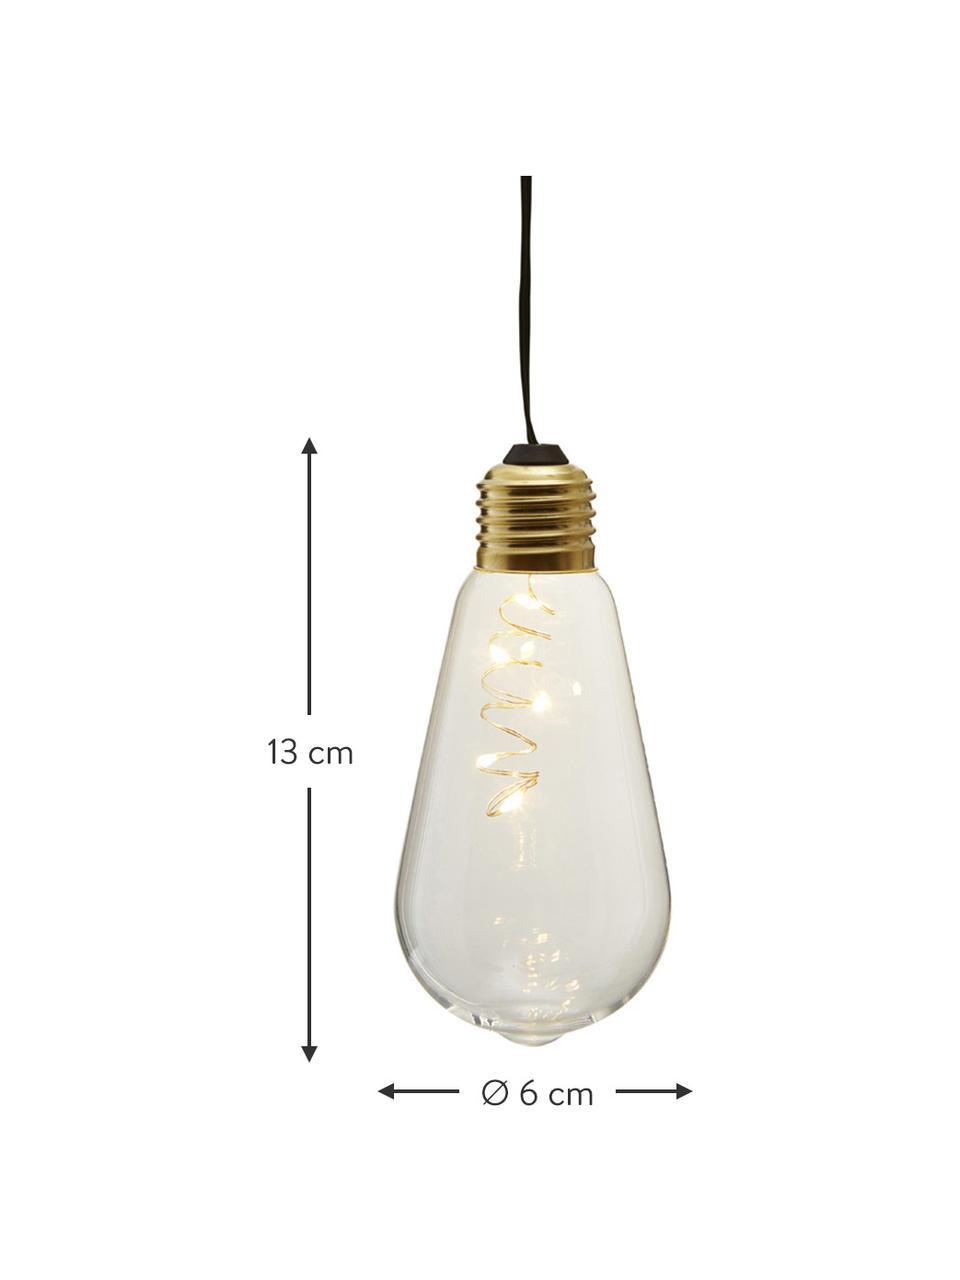 Lampadina decorativa a LED Glow 2pz, Paralume: vetro, Trasparente, Ø 6 x Alt. 13 cm